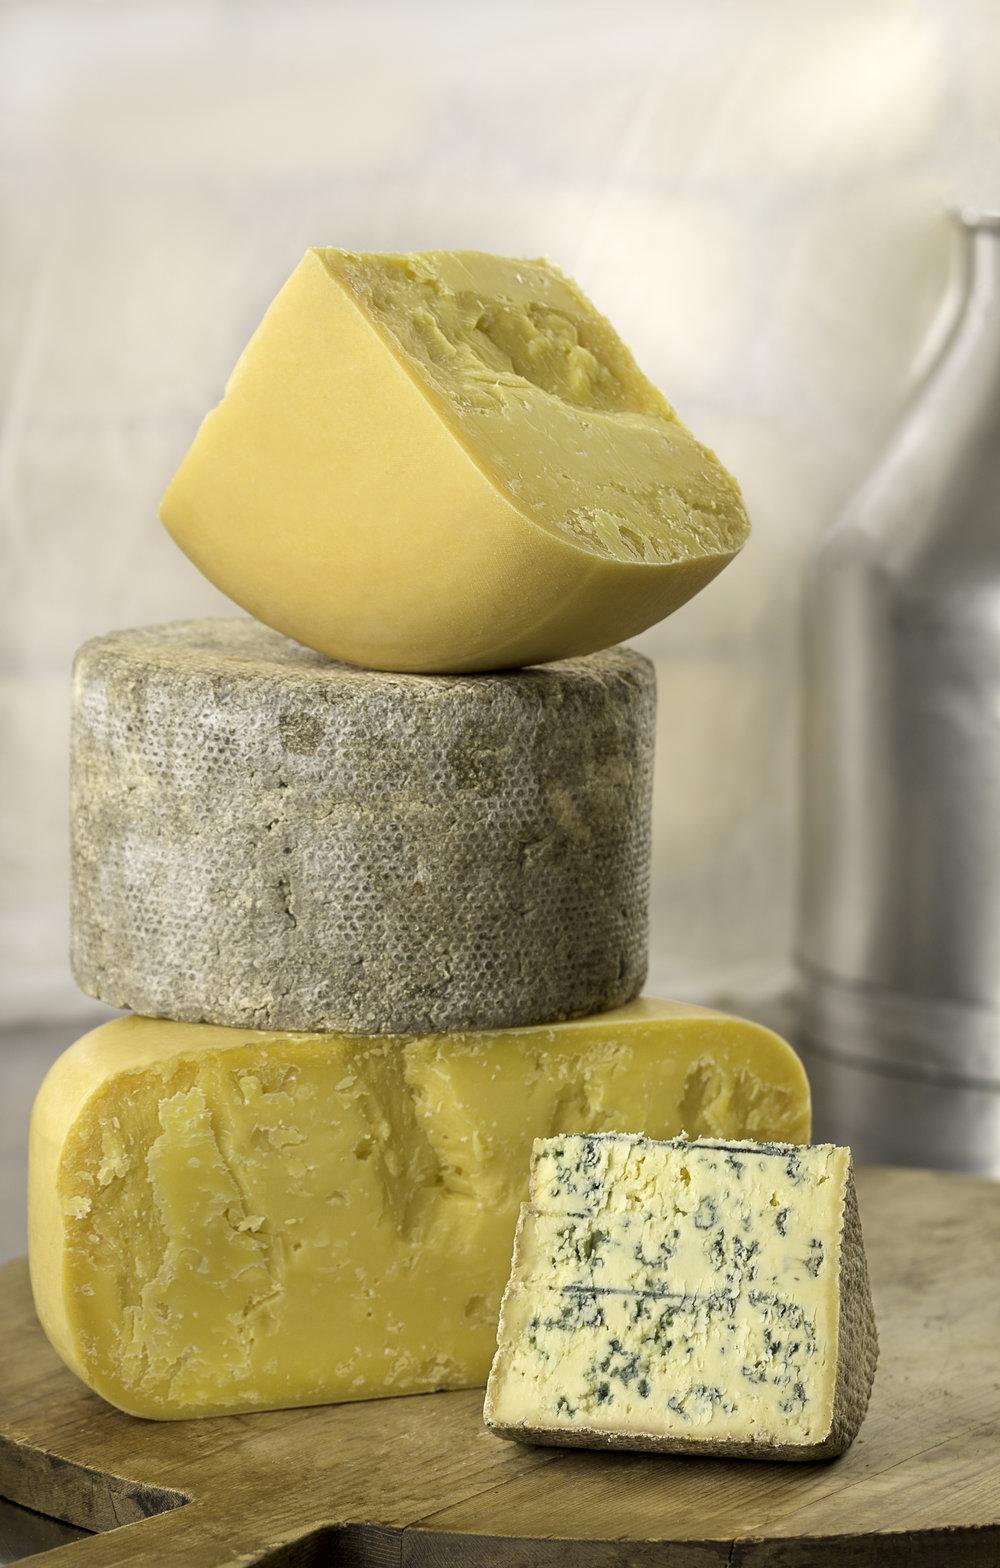 brashearphoto_cheese_milkcan_+.50exposure-1.jpg